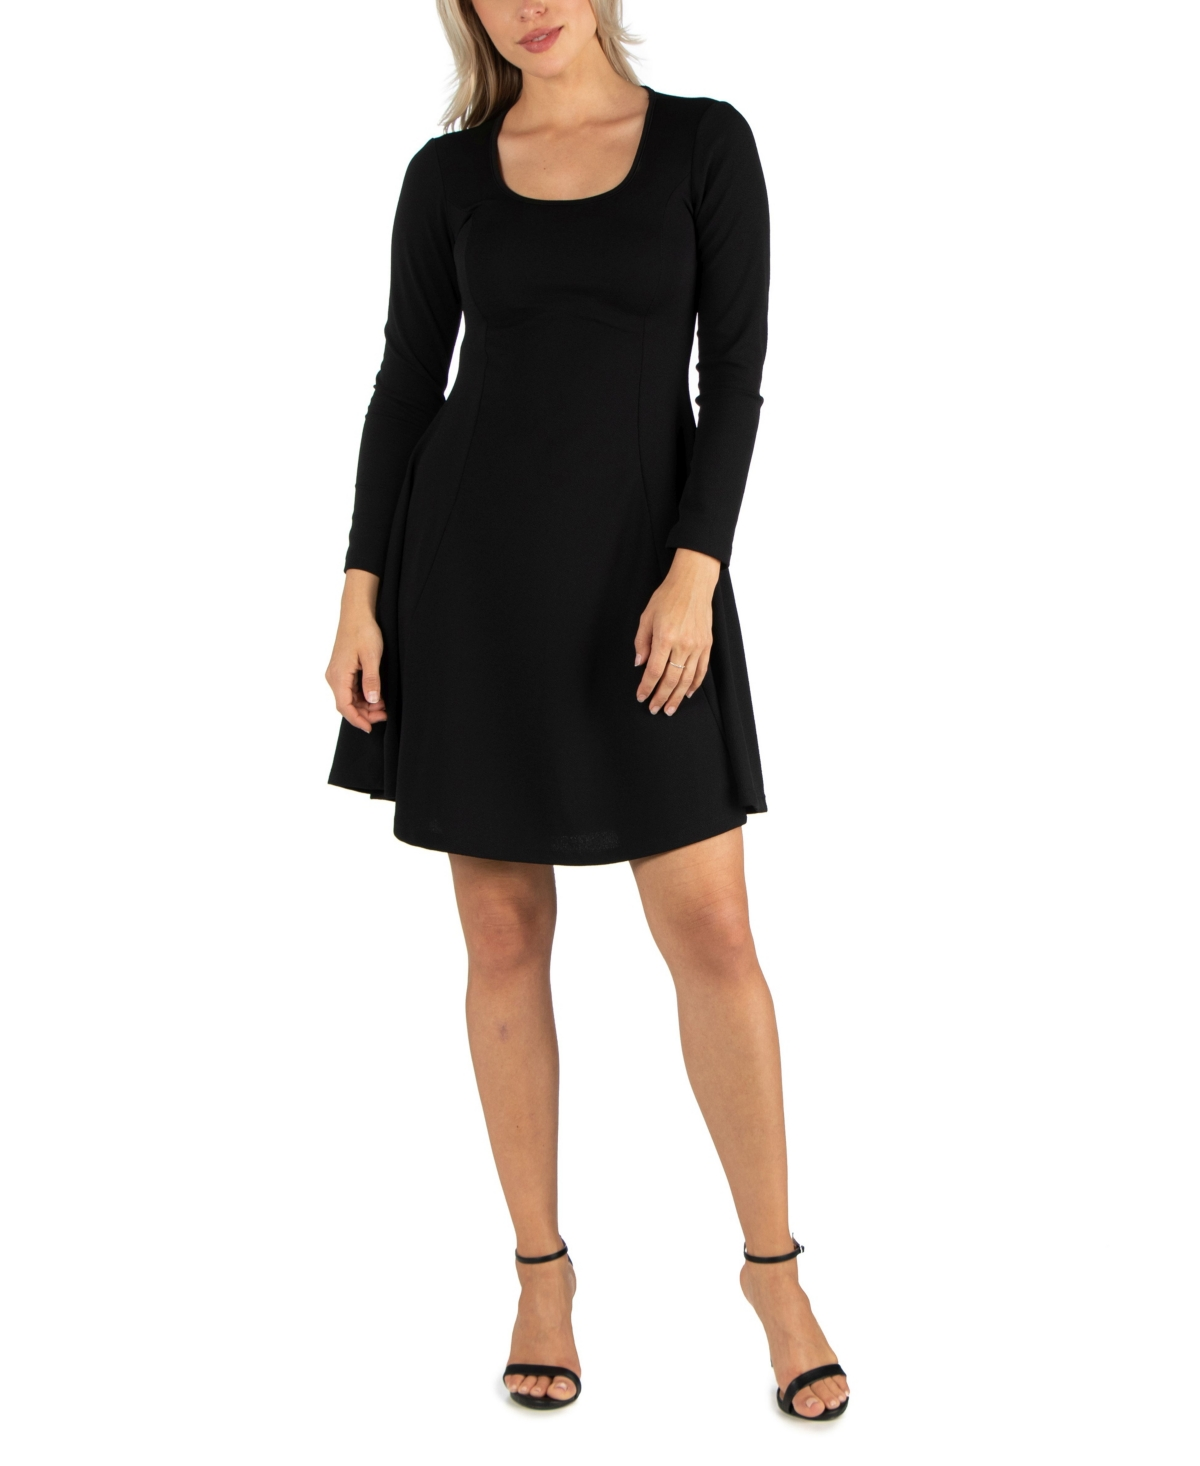 24seven Comfort Apparel Womens Simple Long Sleeve Knee Length Flared Dress